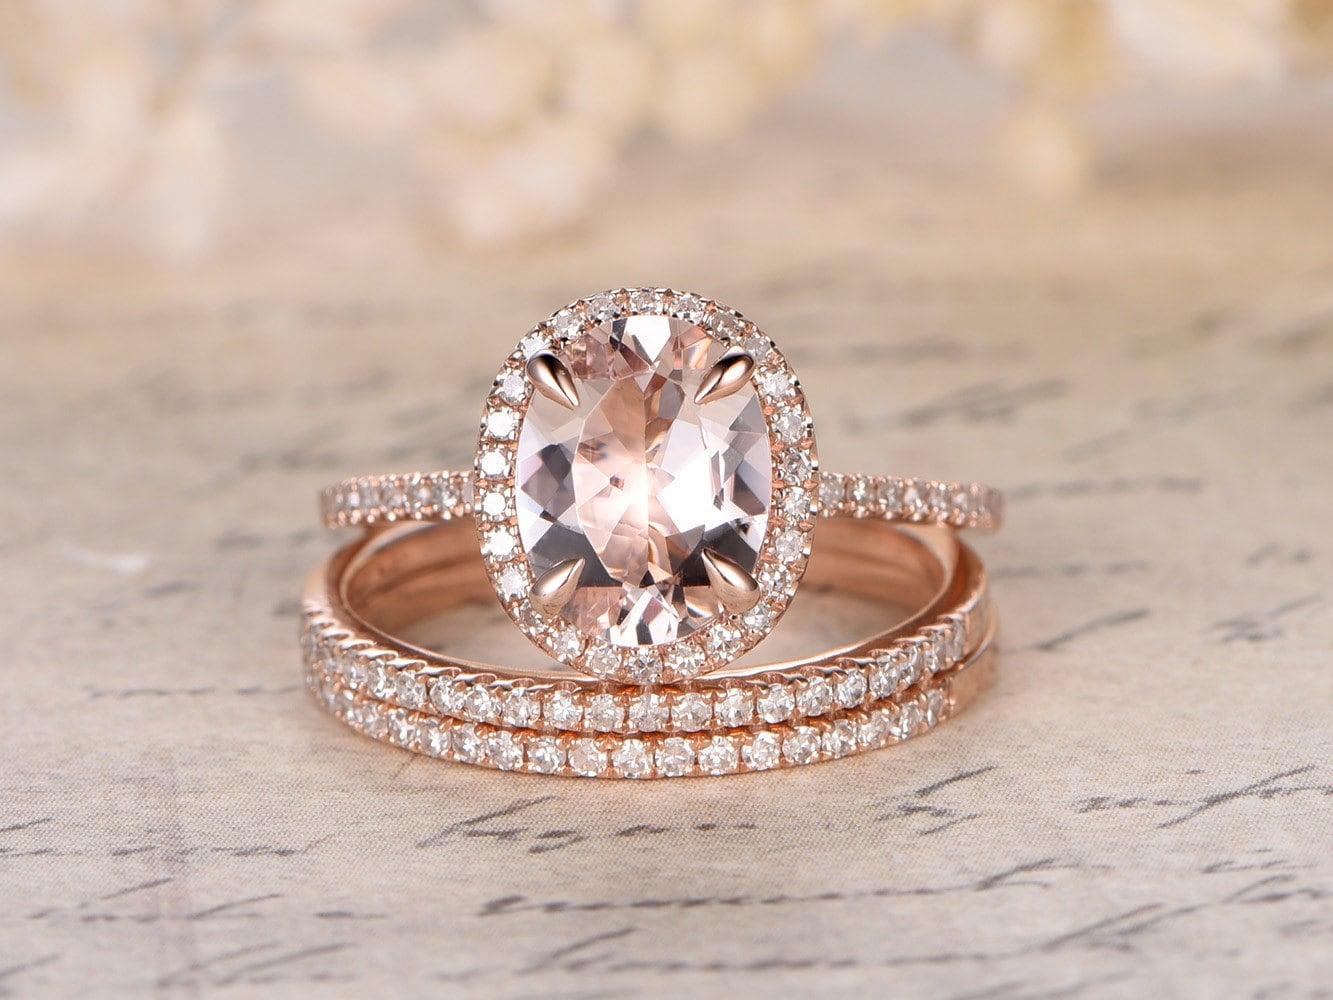 valentines present 6x8mm oval cut morganite ringpink morganite engagement ring setthin diamond - Diamond Wedding Rings Sets